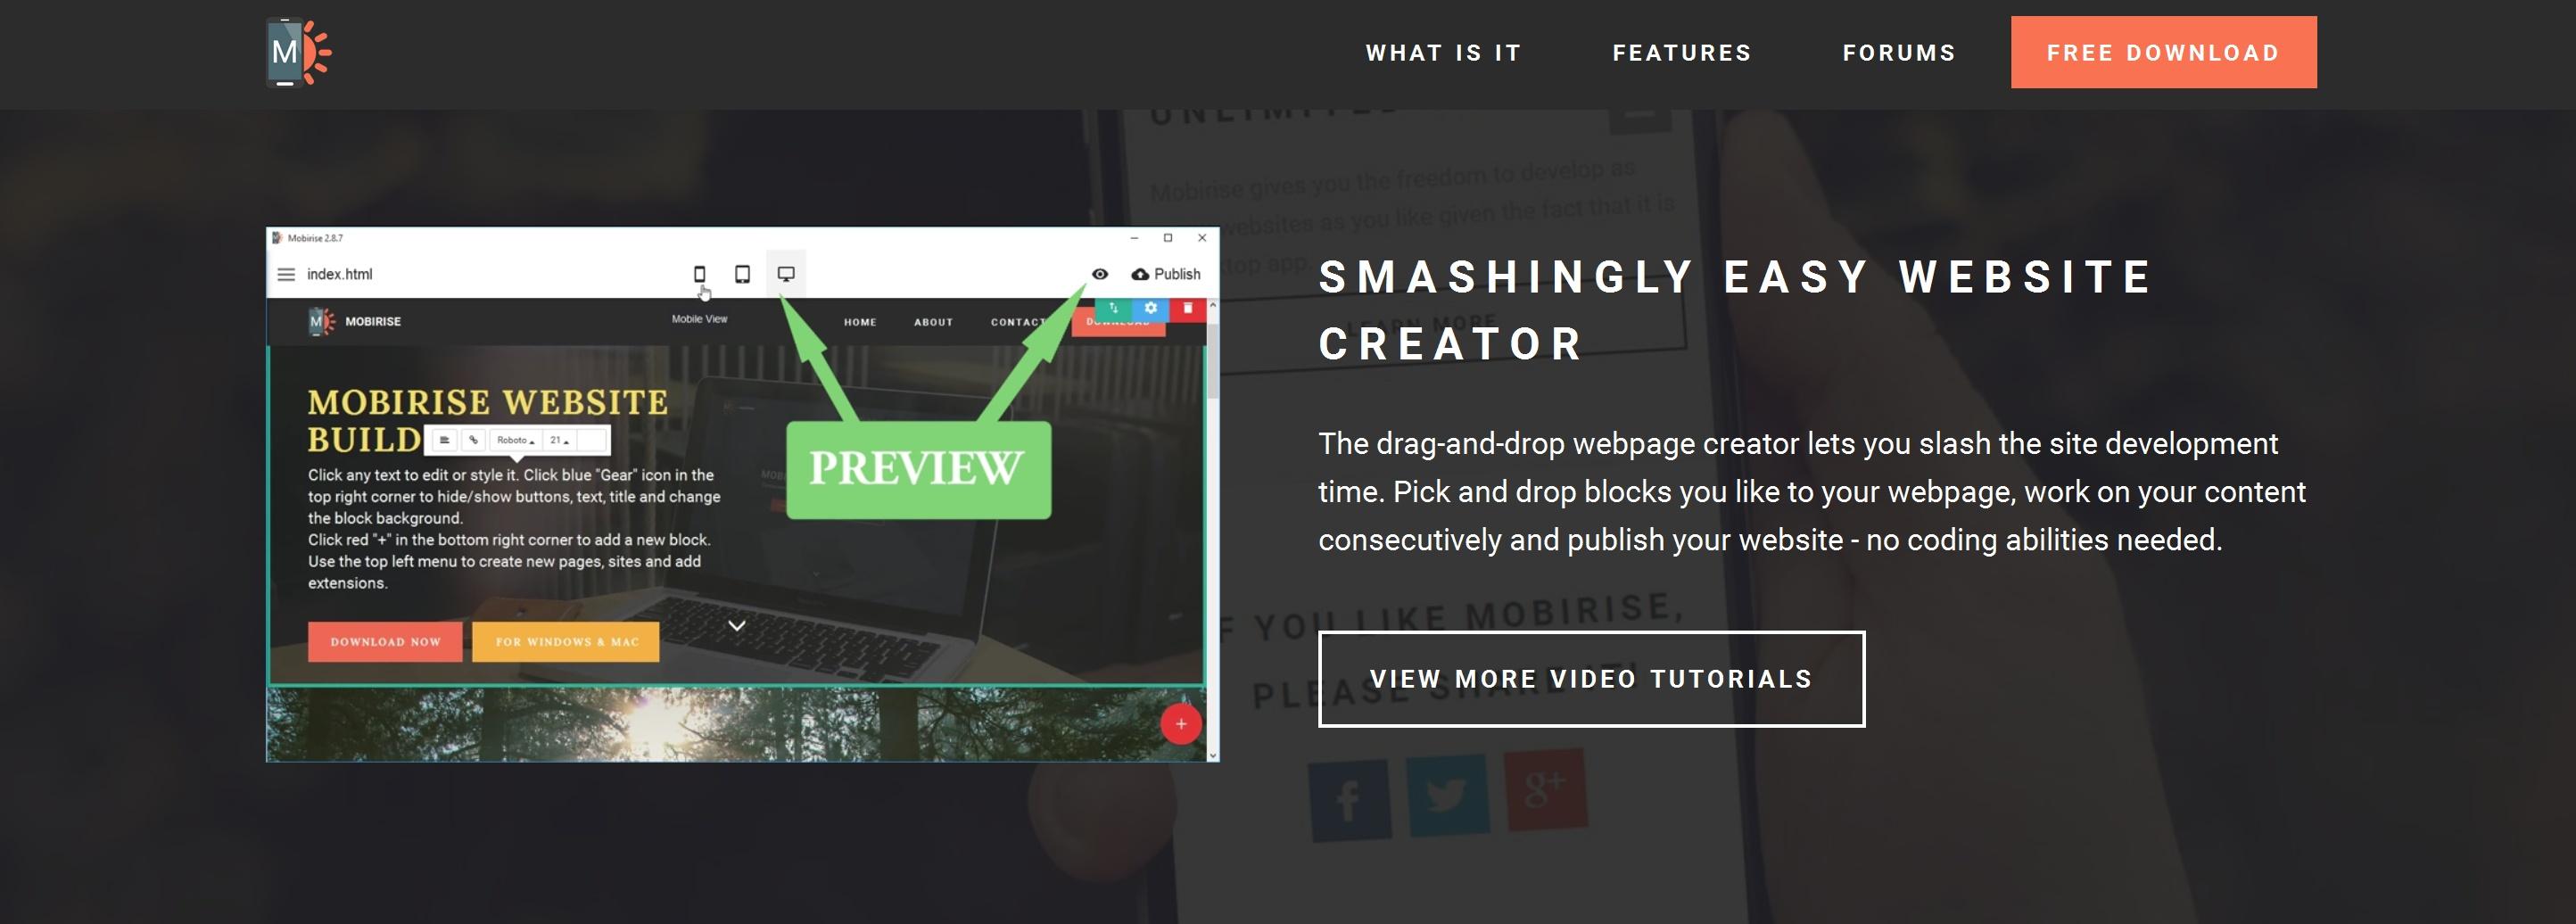 Simple WYSIWYG Web Page  Creator Software